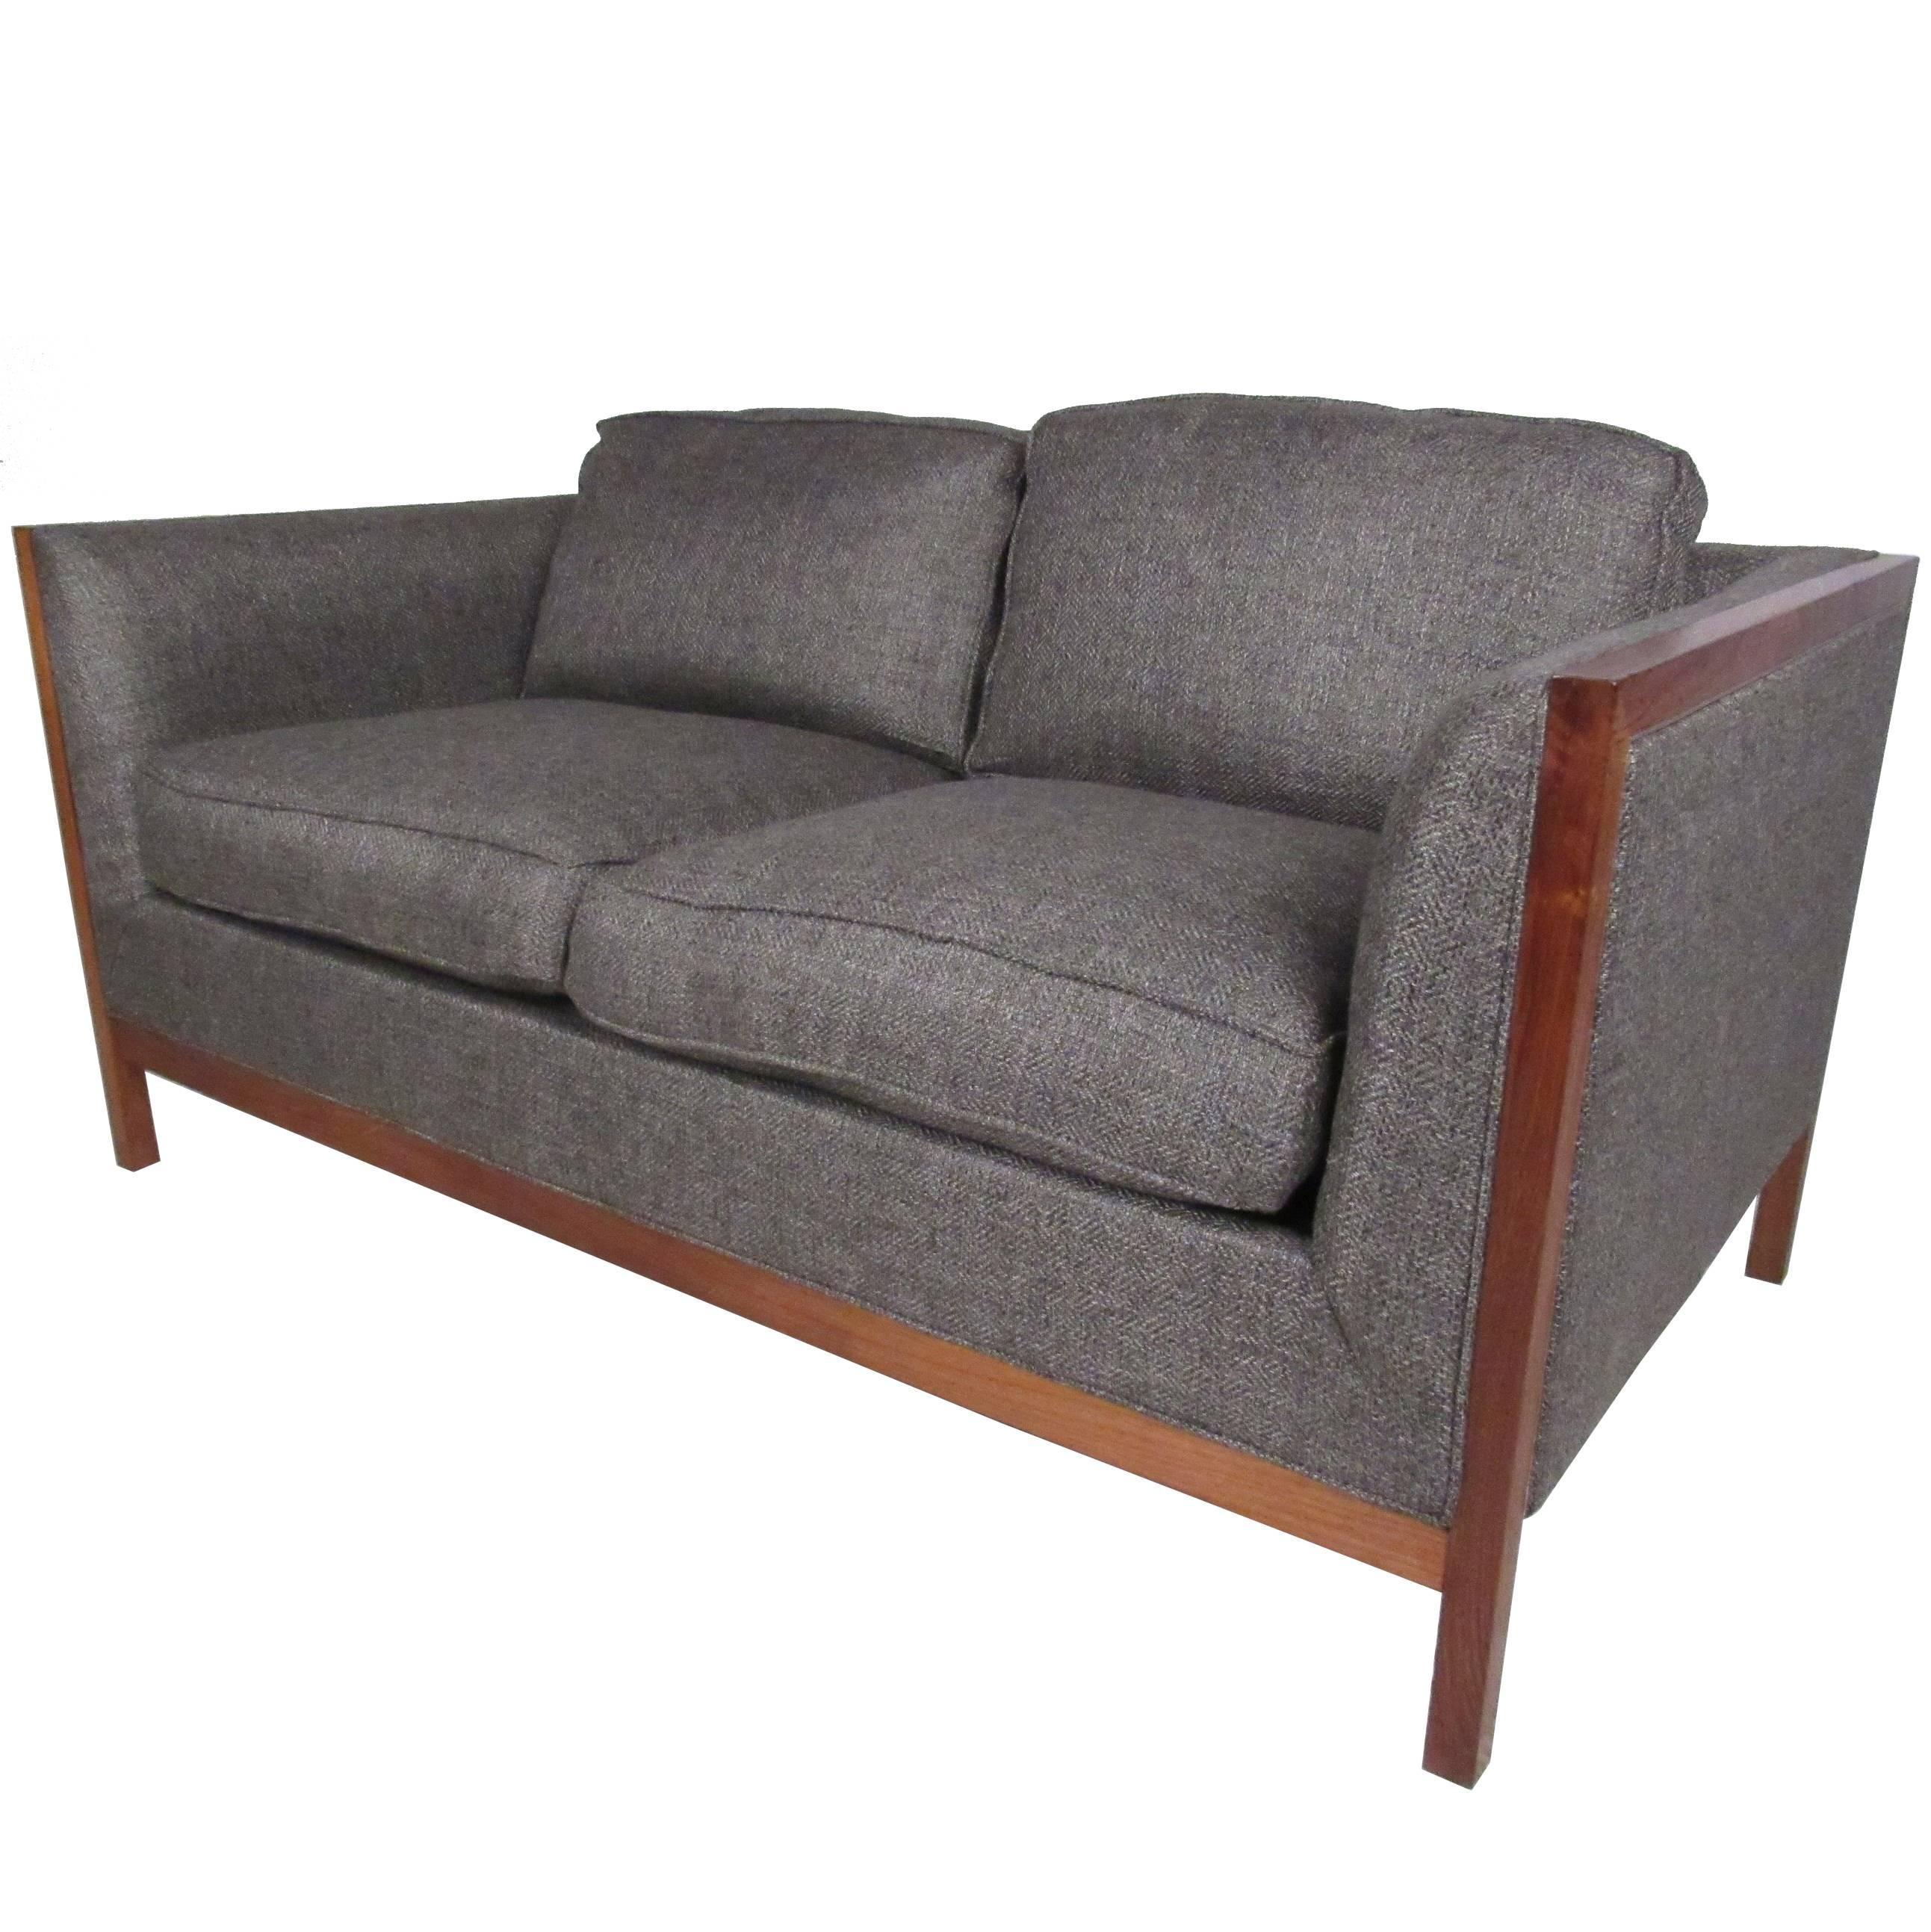 midcentury twoseat sofa by stow davis